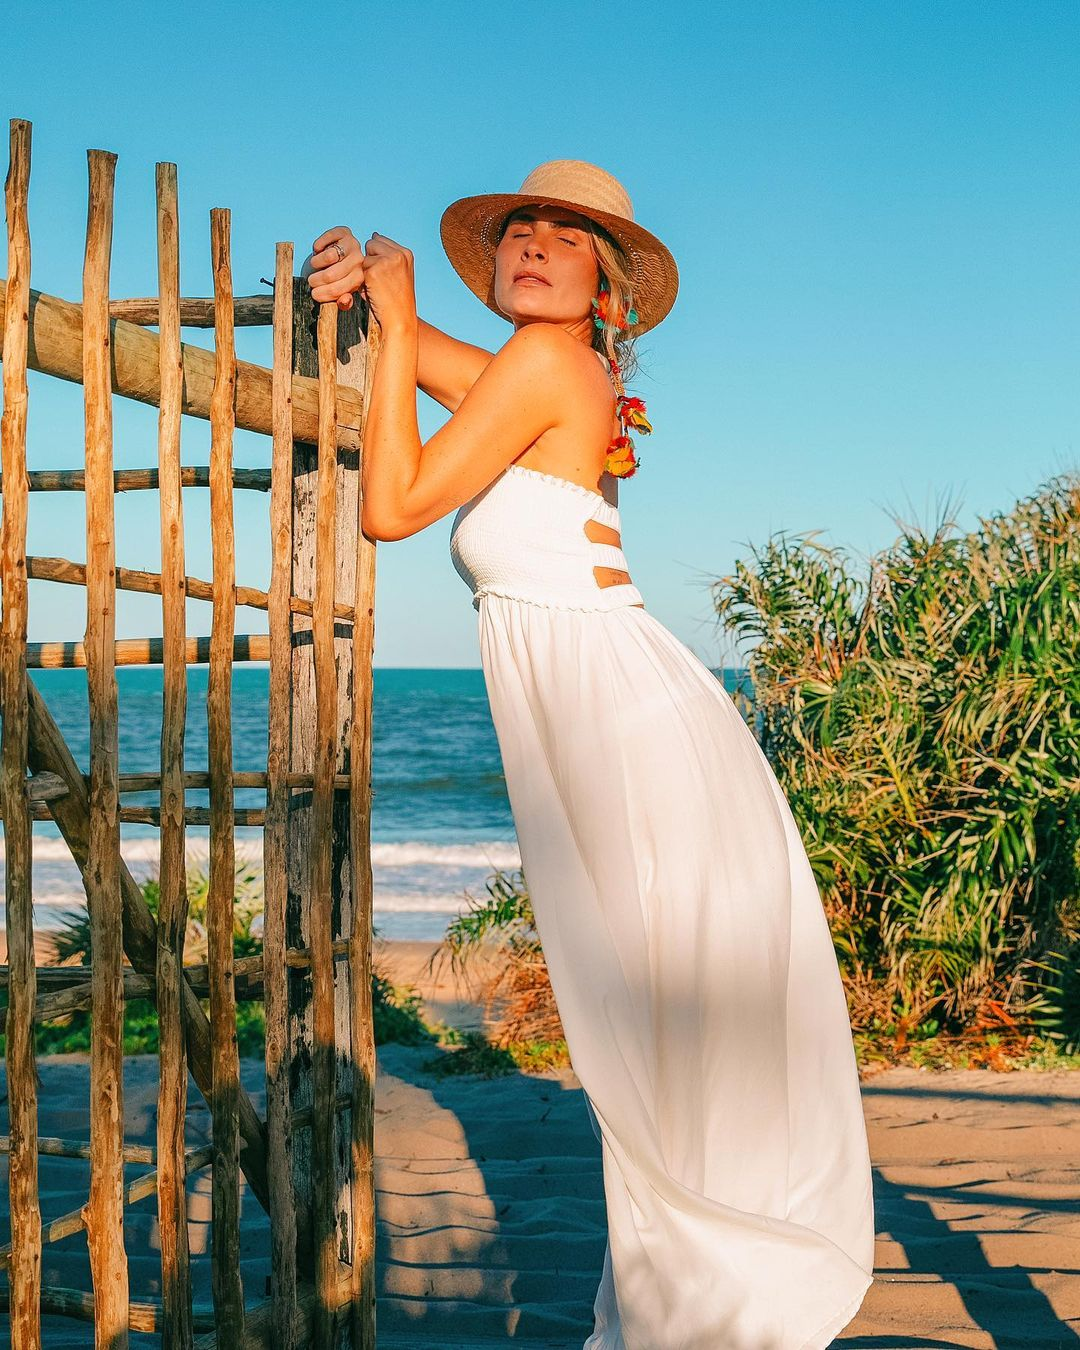 A atriz Julia Faria é apaixonada por vestidos longos. (Foto: Instagram/ @juliafaria)